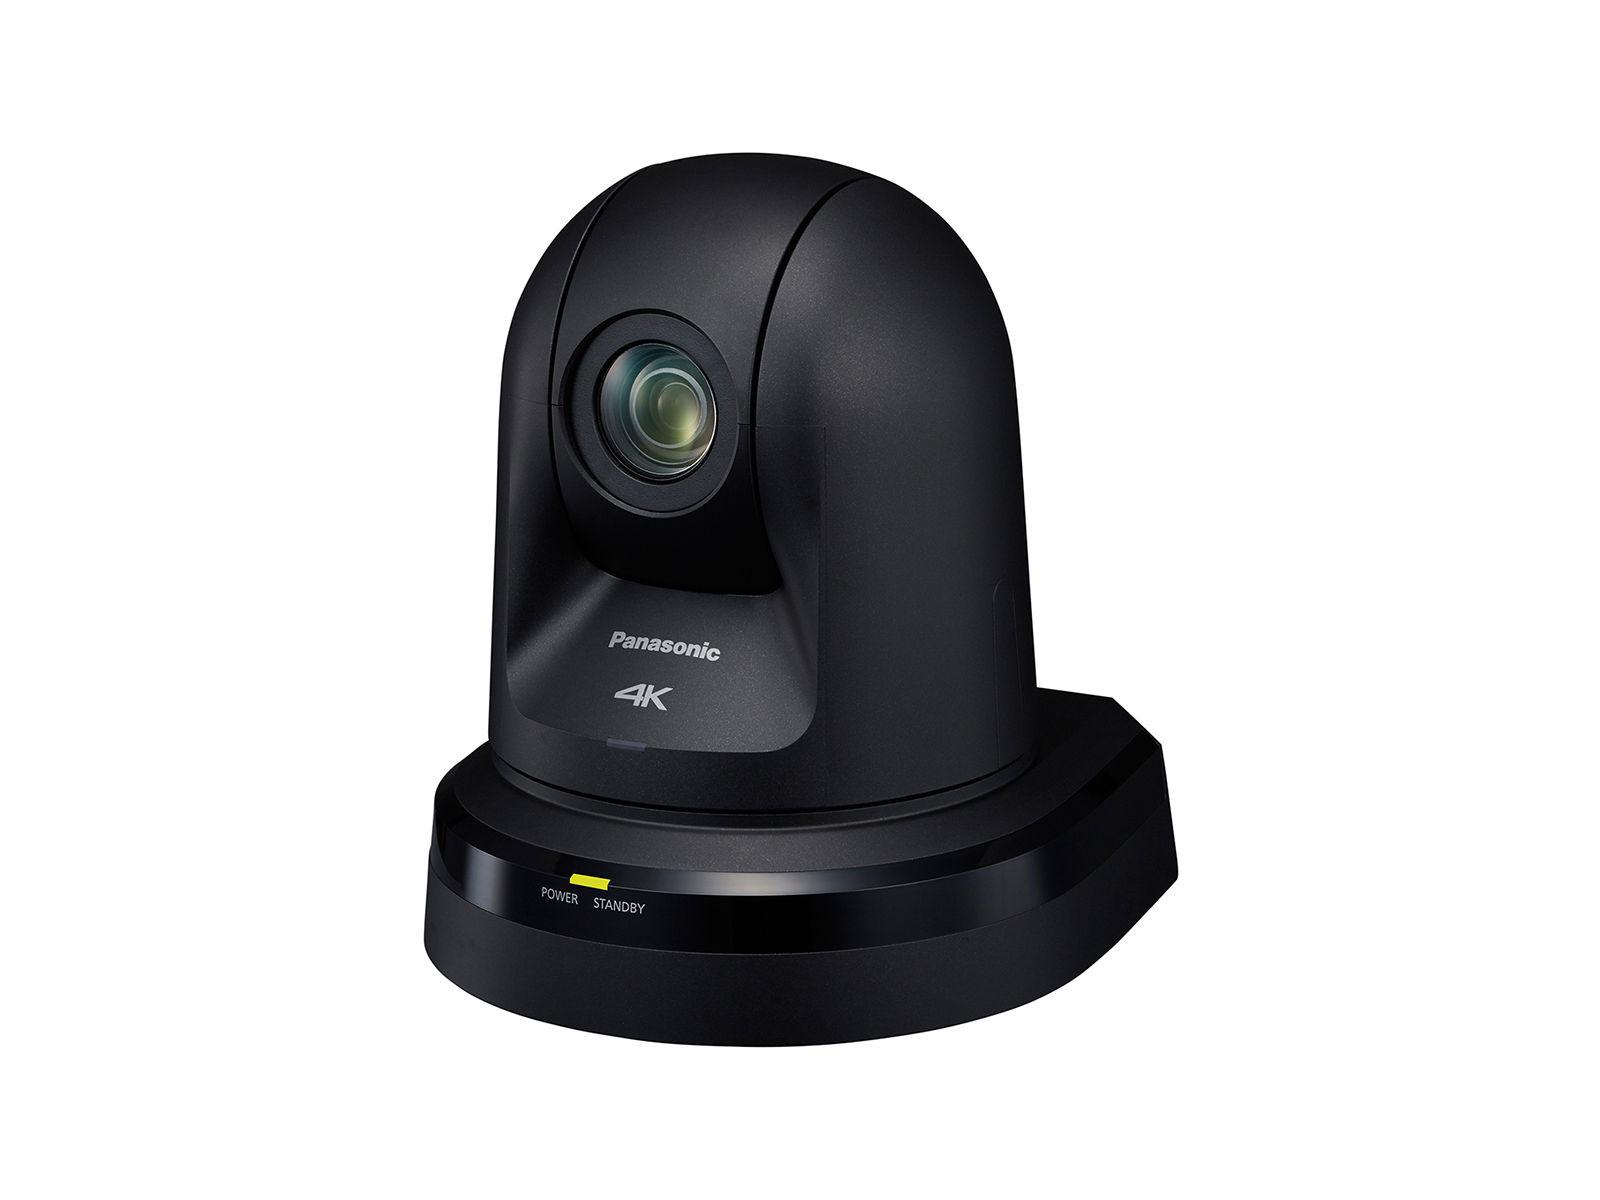 Panasonic AW-UE70KEJ | 4K-Remote-Kamera, schwarz, HDMI, USB, LAN, IP, 20-fach Zoom